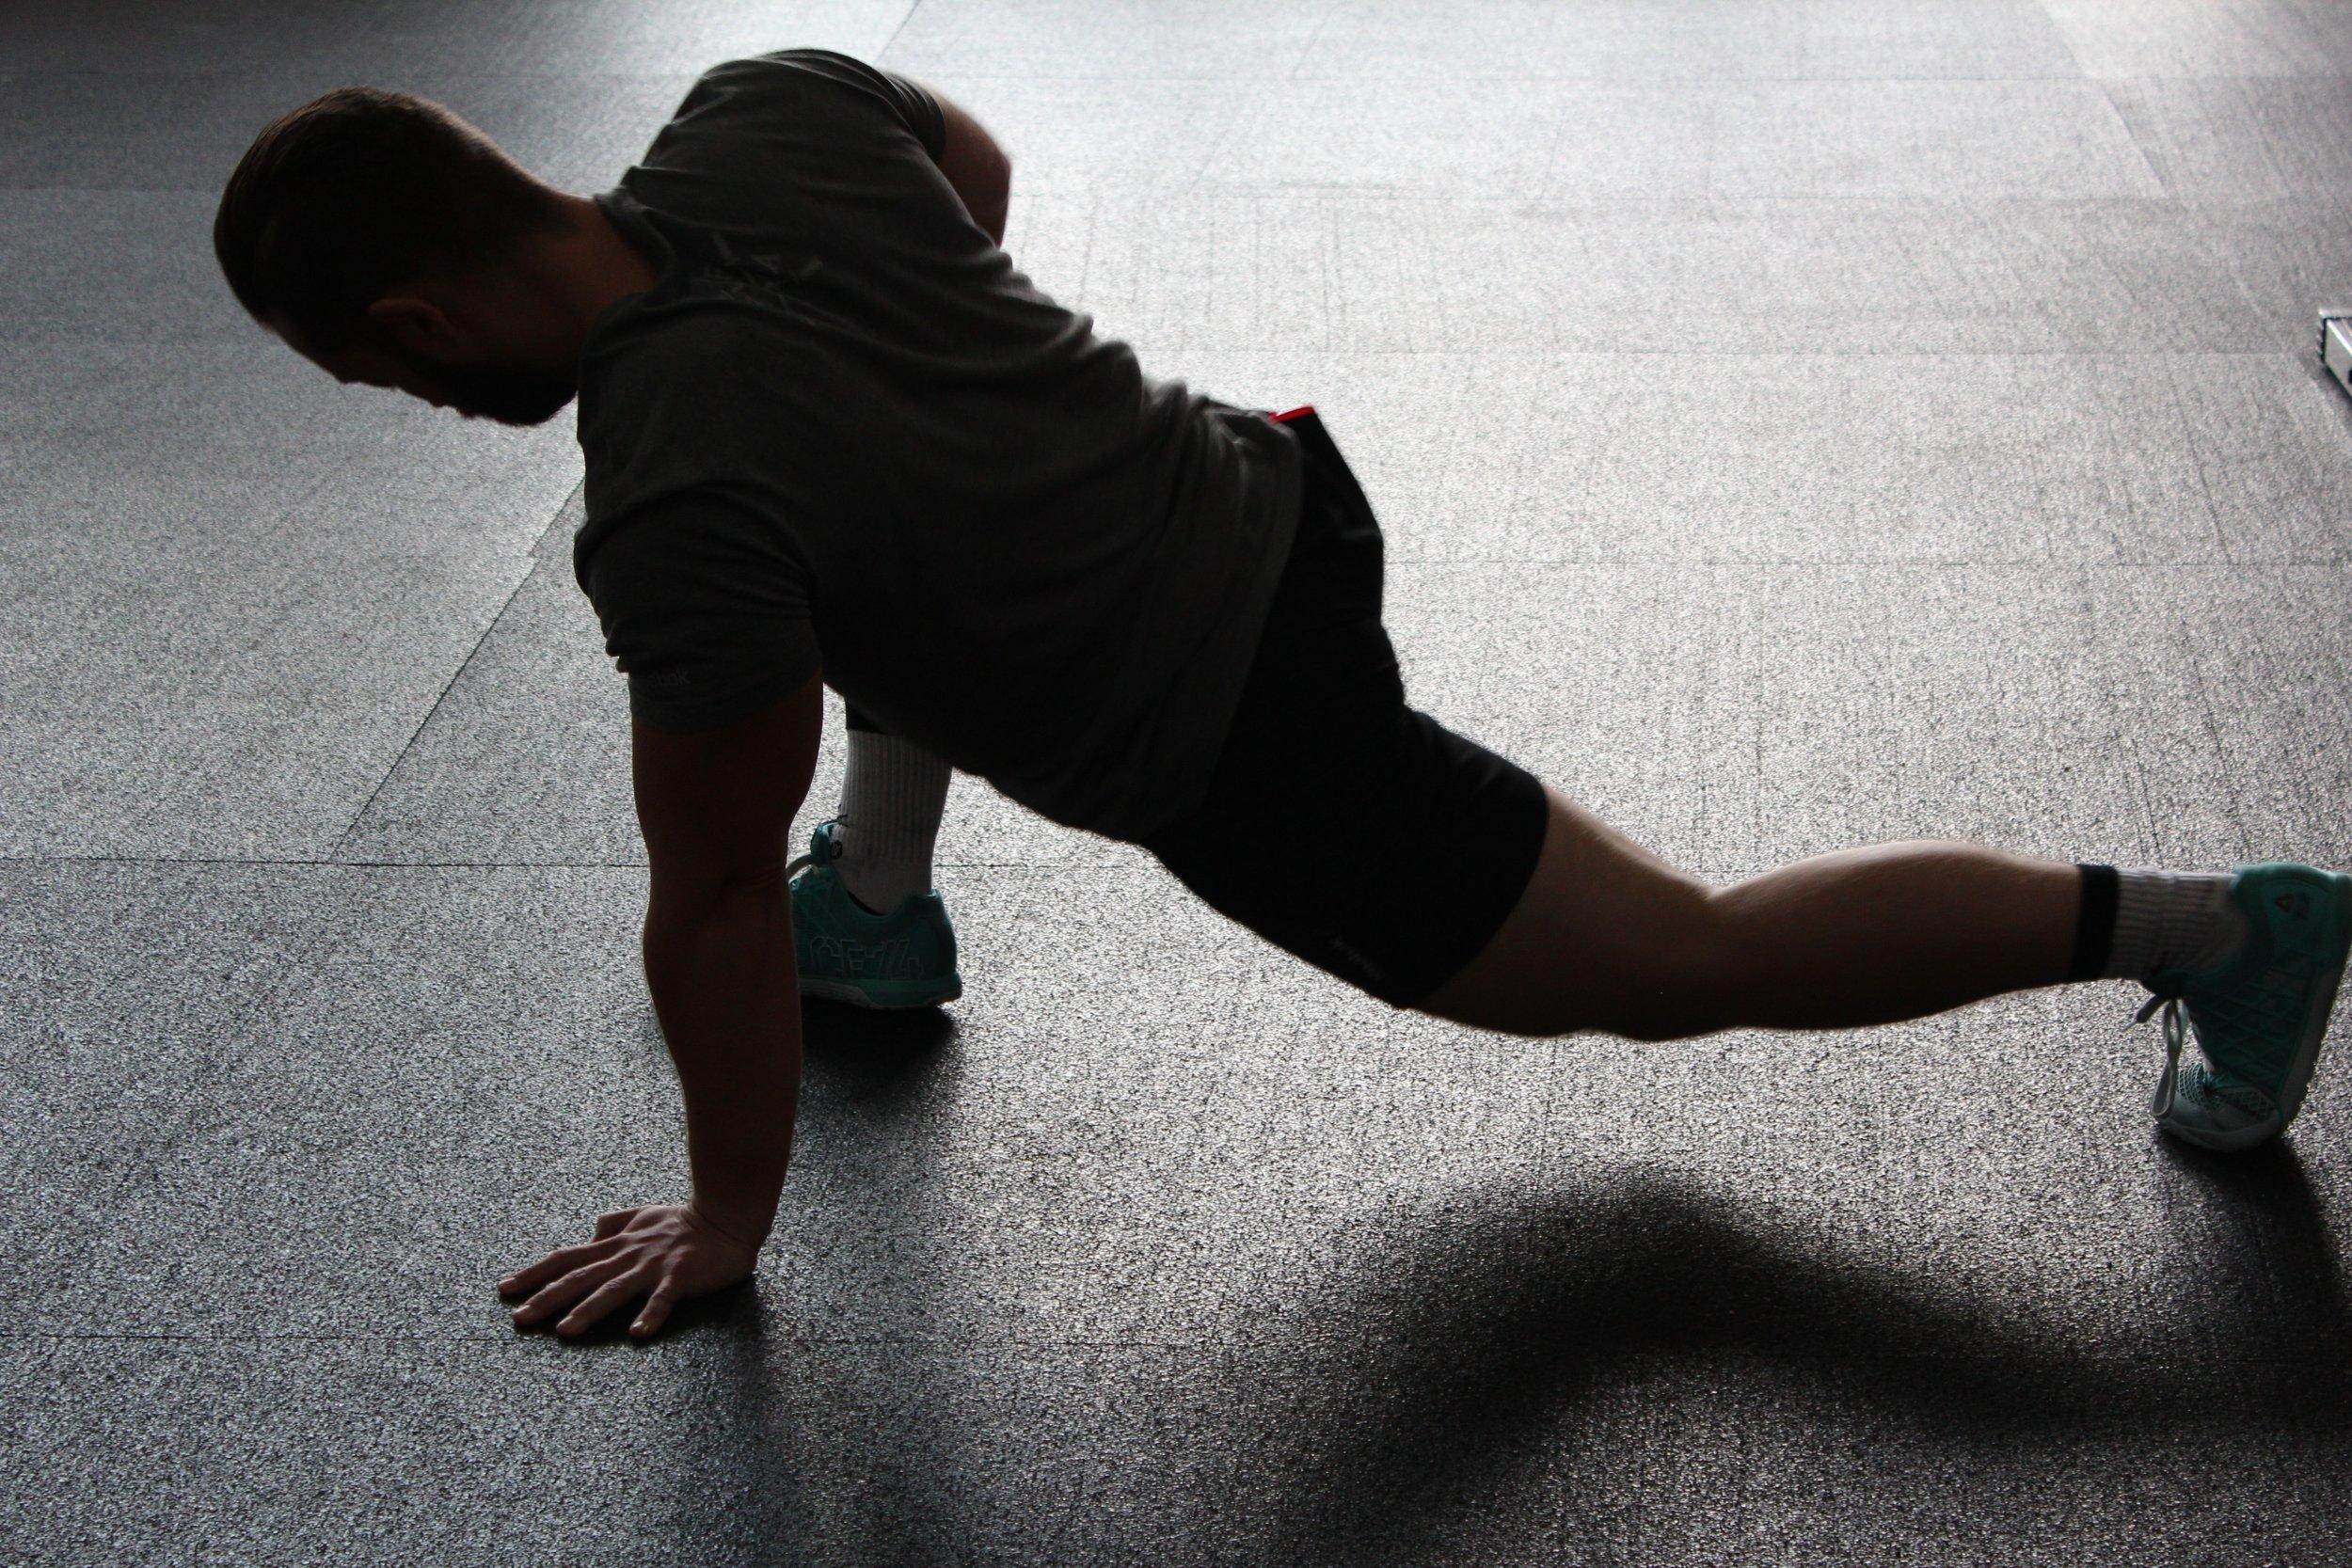 athlete-exercise-man-209969.jpg